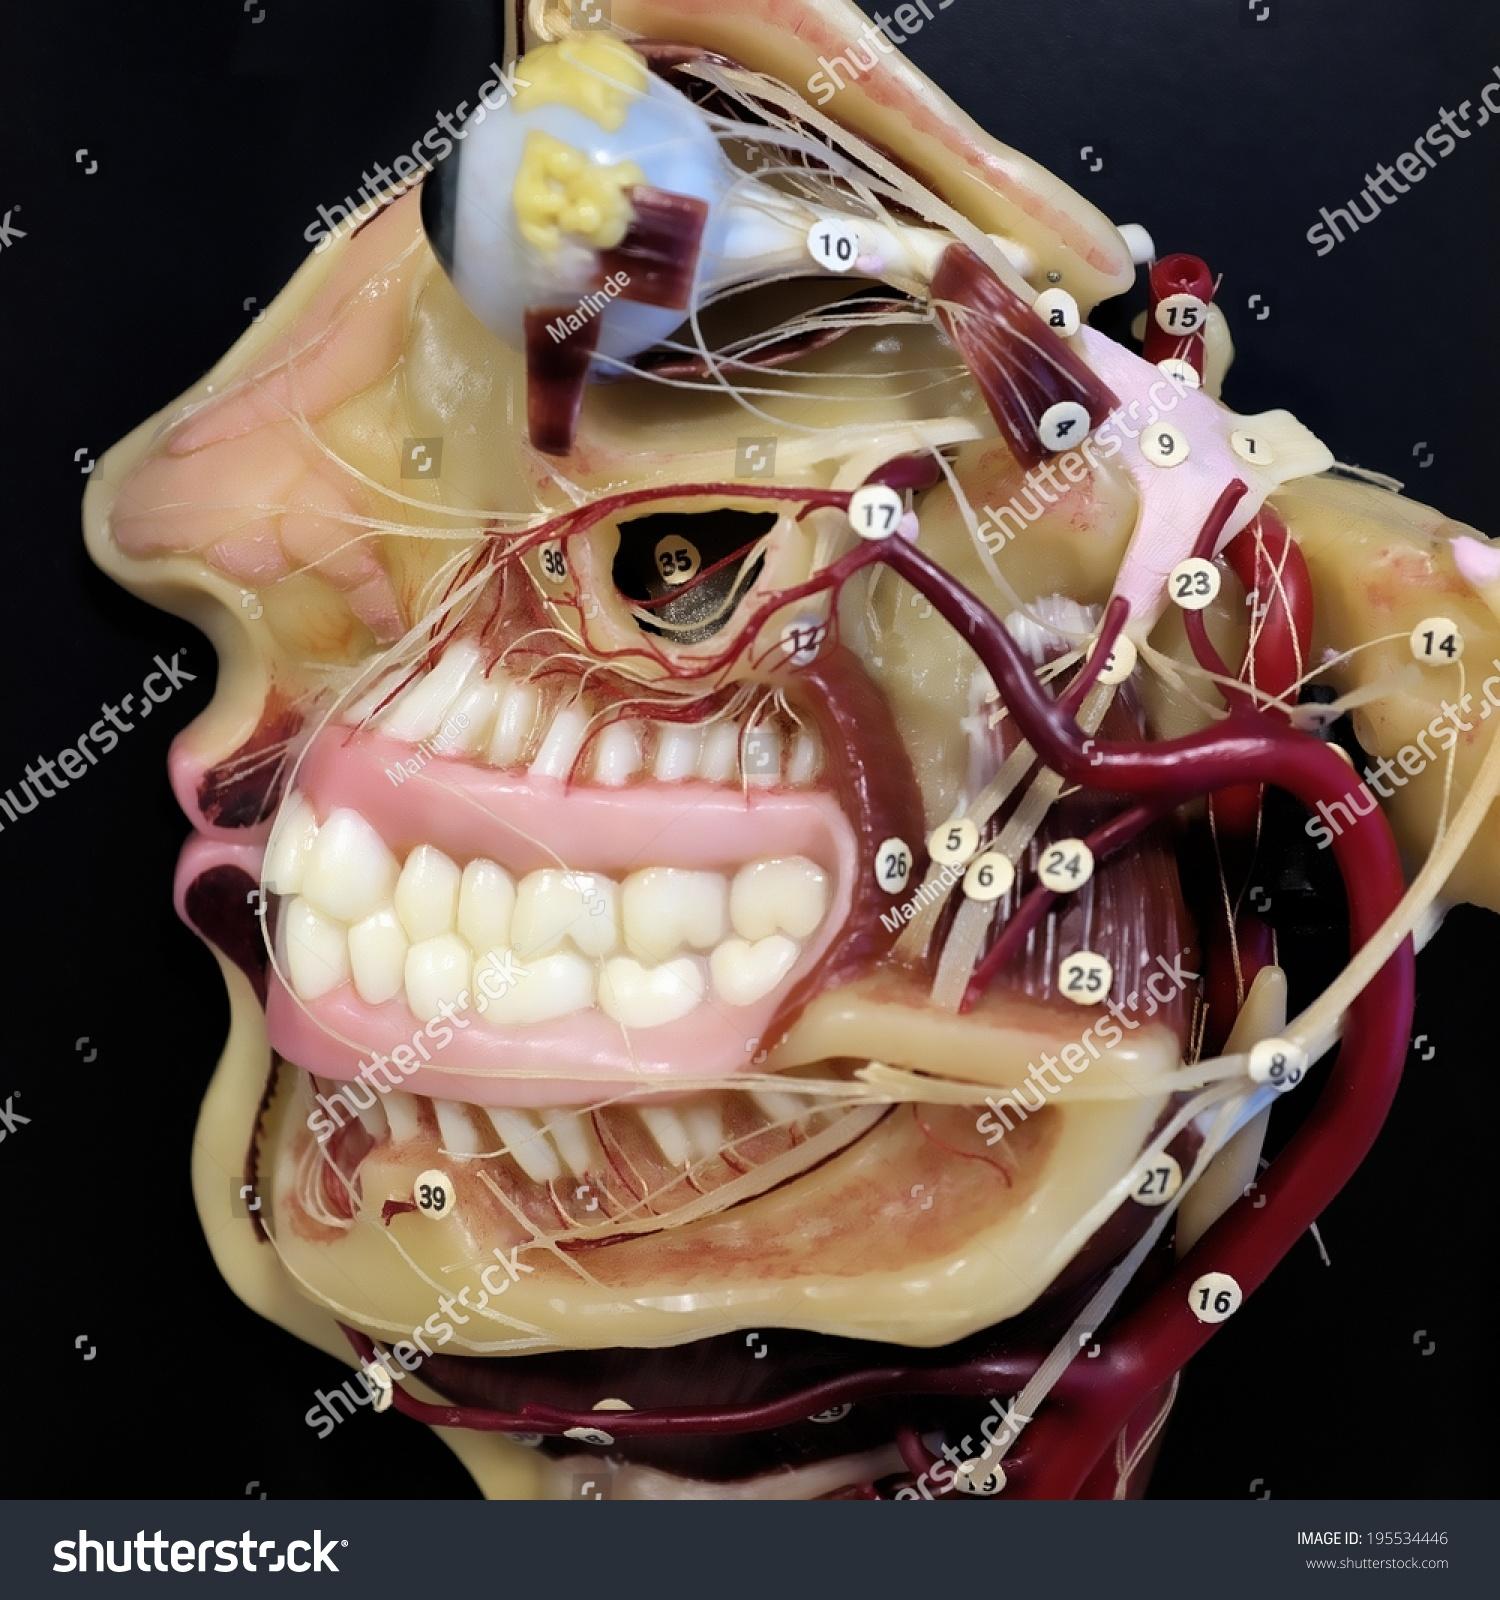 Anatomy Maxilla Mandible Stock Photo Safe To Use 195534446